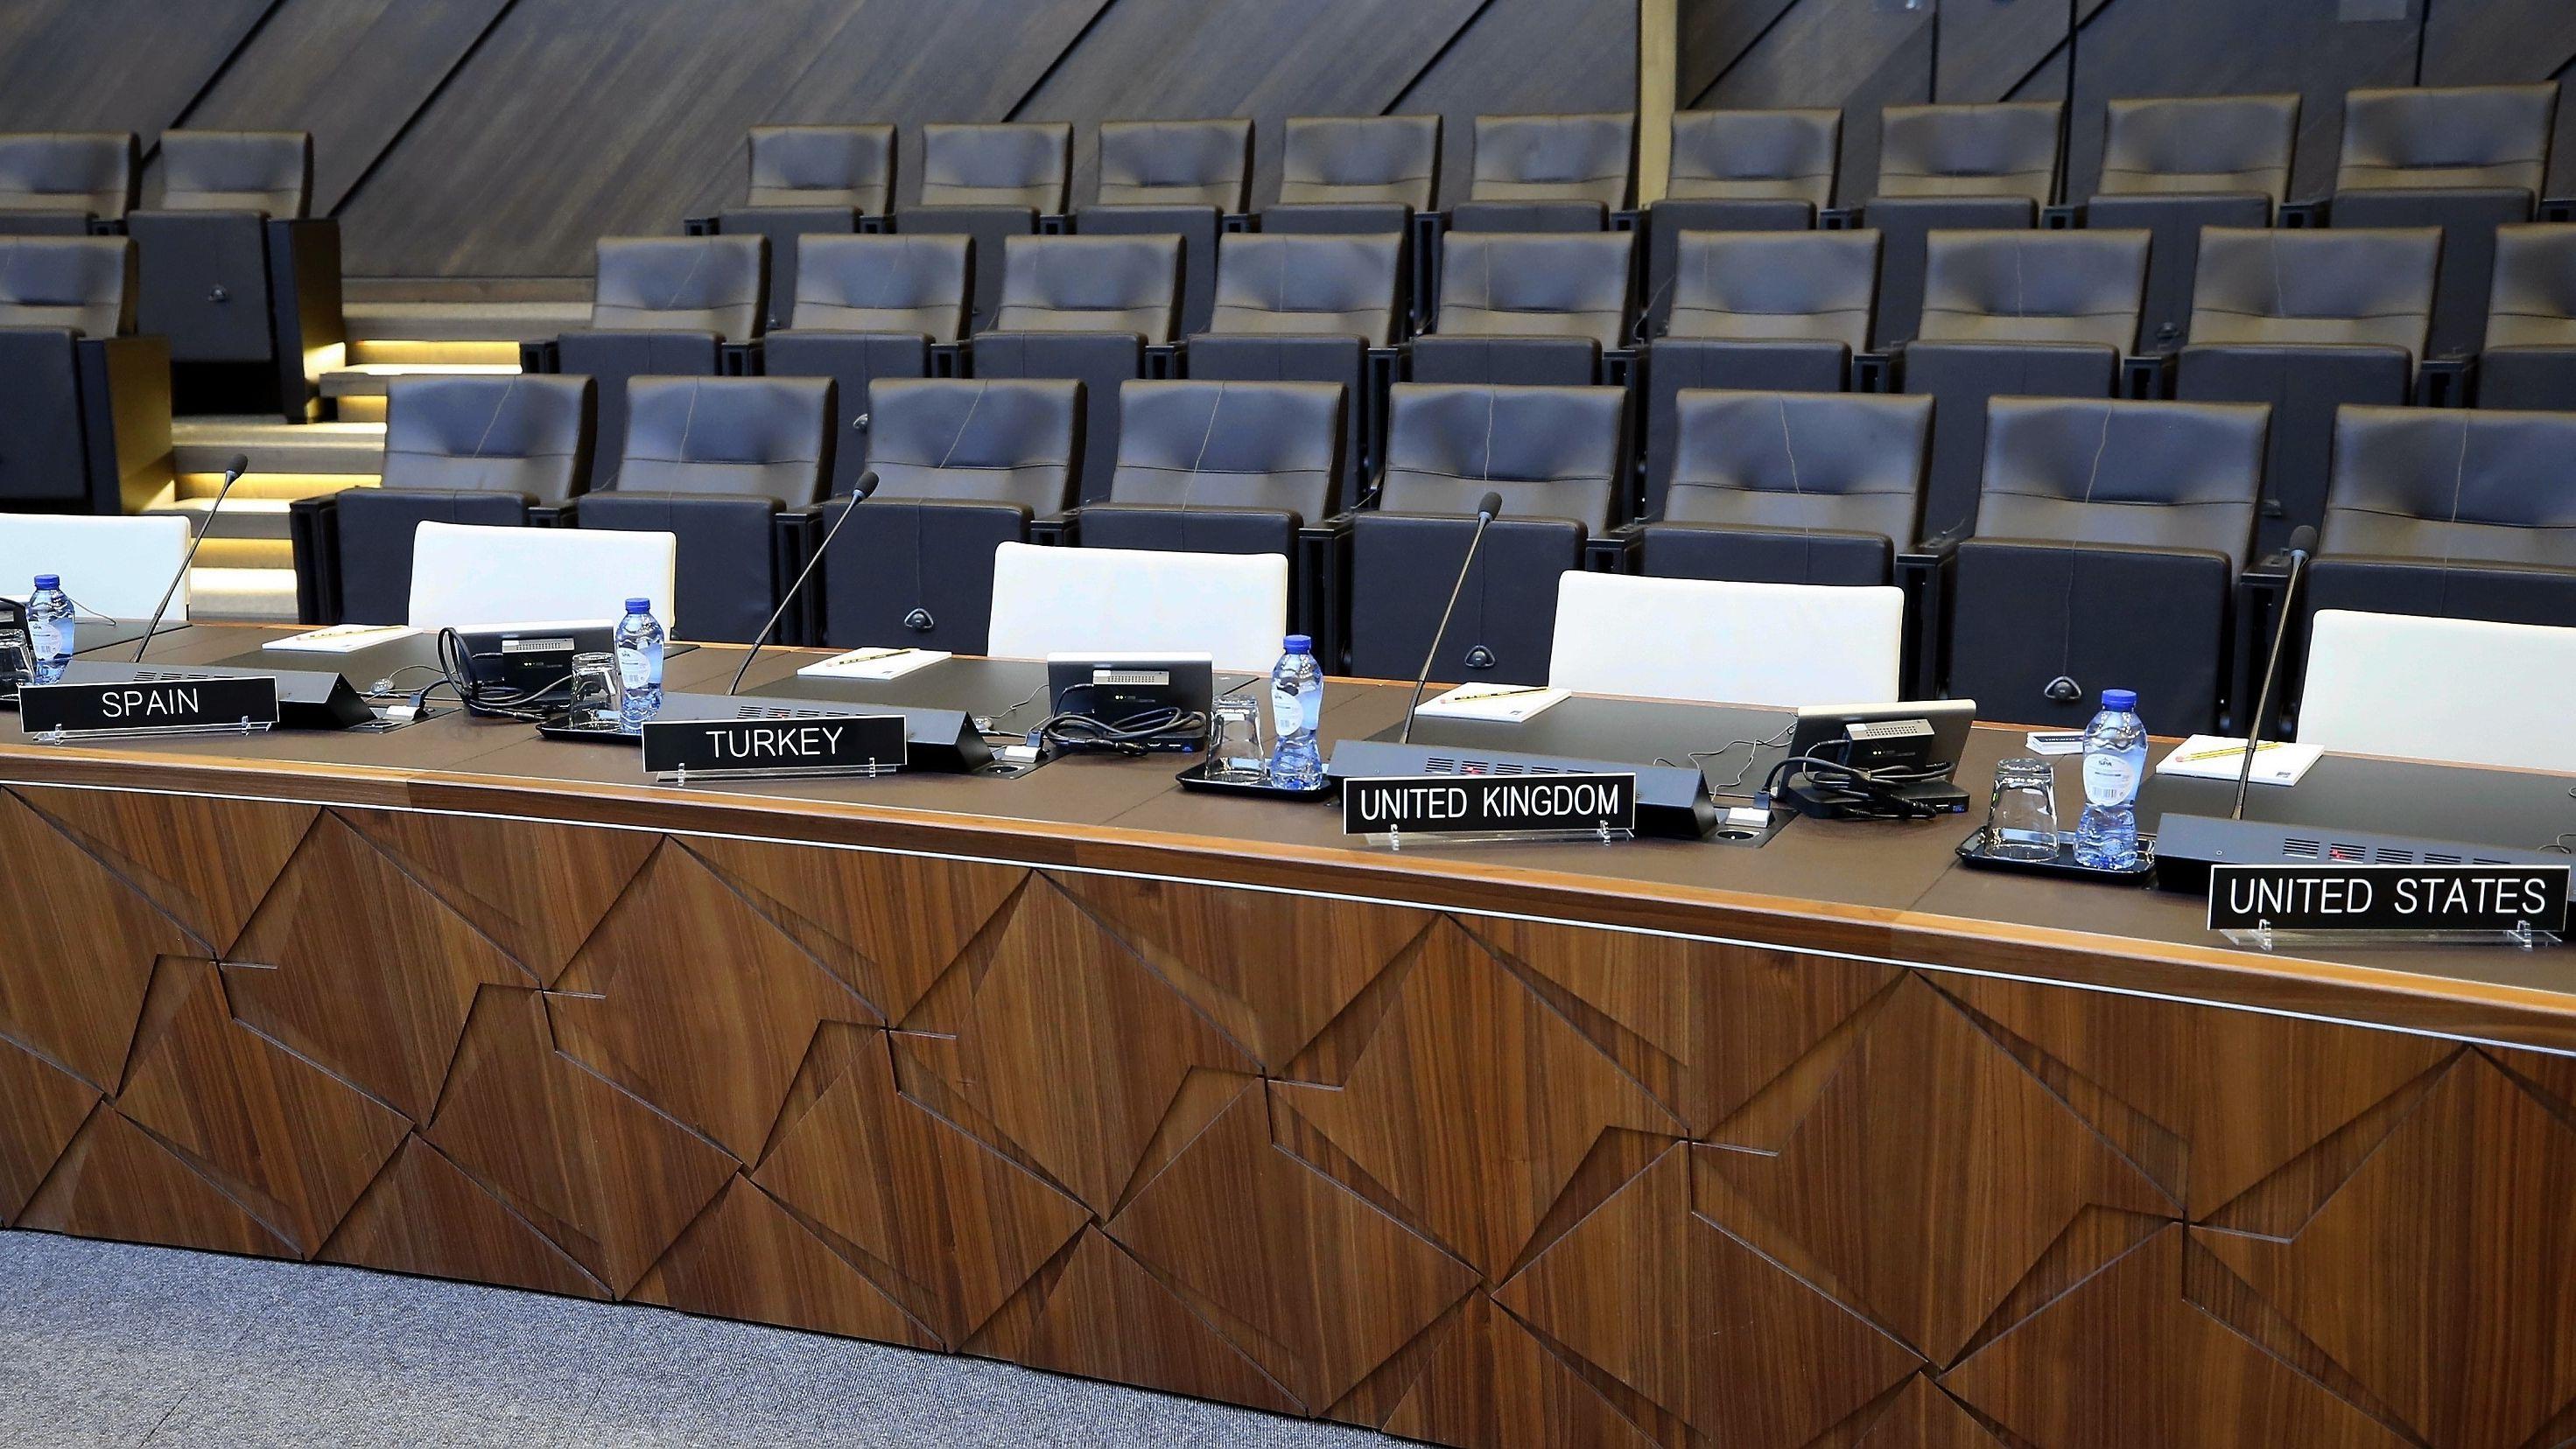 Leerer Konferenzsaal im NATO-Hauptquartier